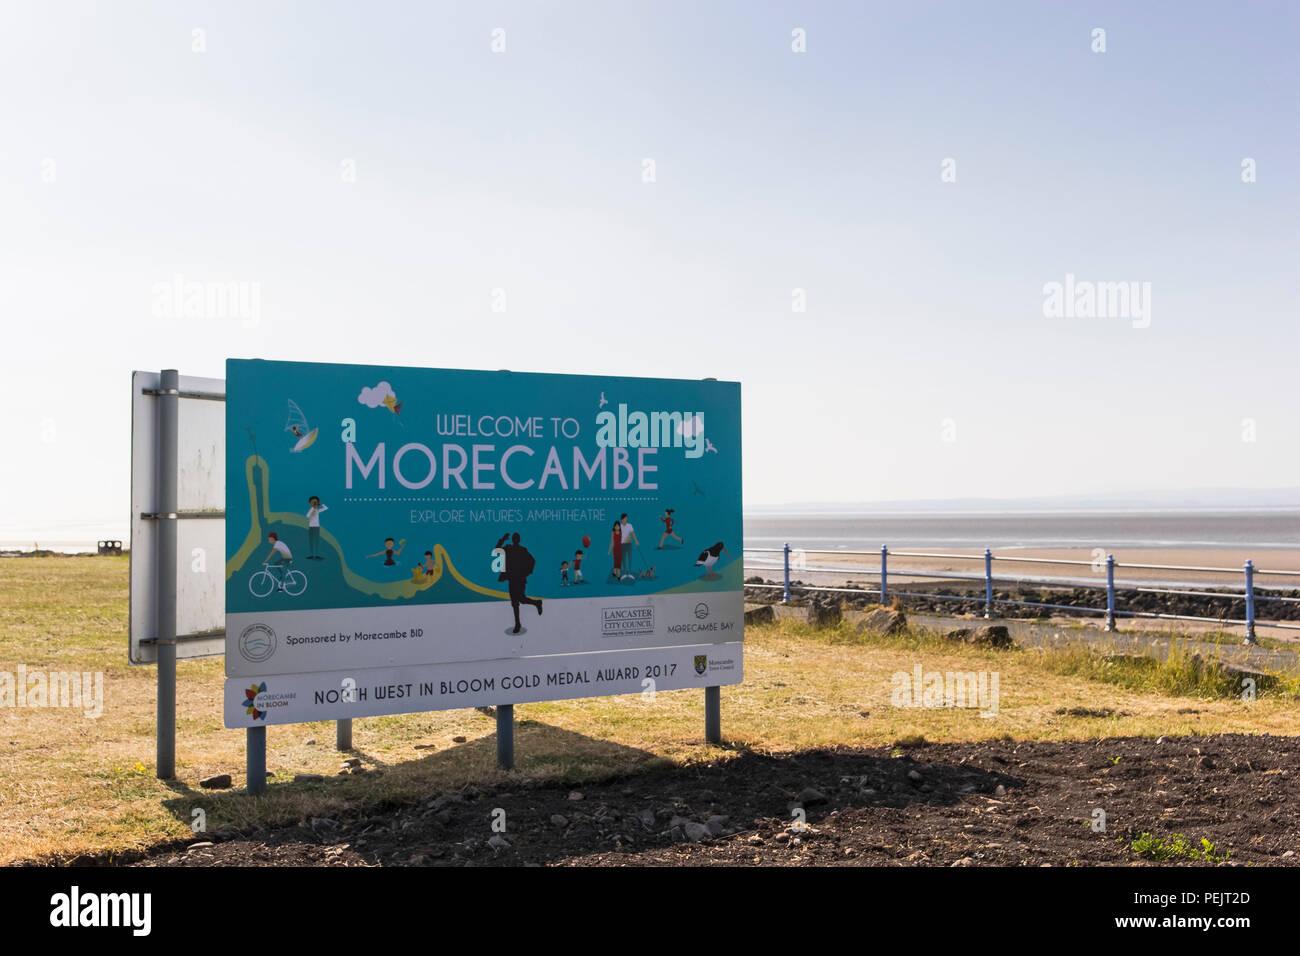 Morecambe sign at the seaside resort in Lancashire, UK - Stock Image